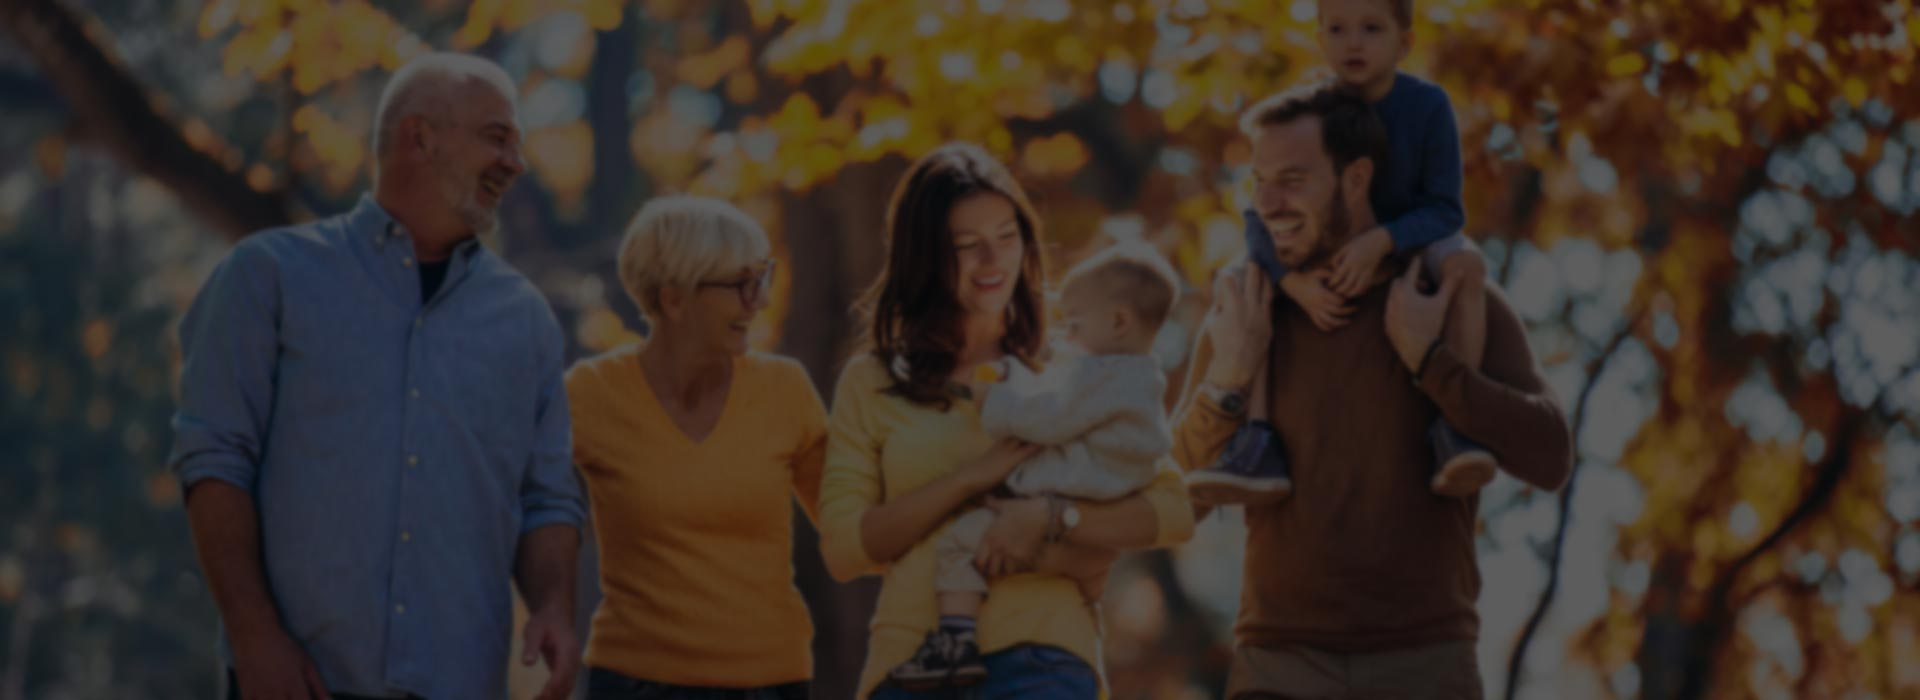 Family Outside - Estate Litigation Altoona, Iowa